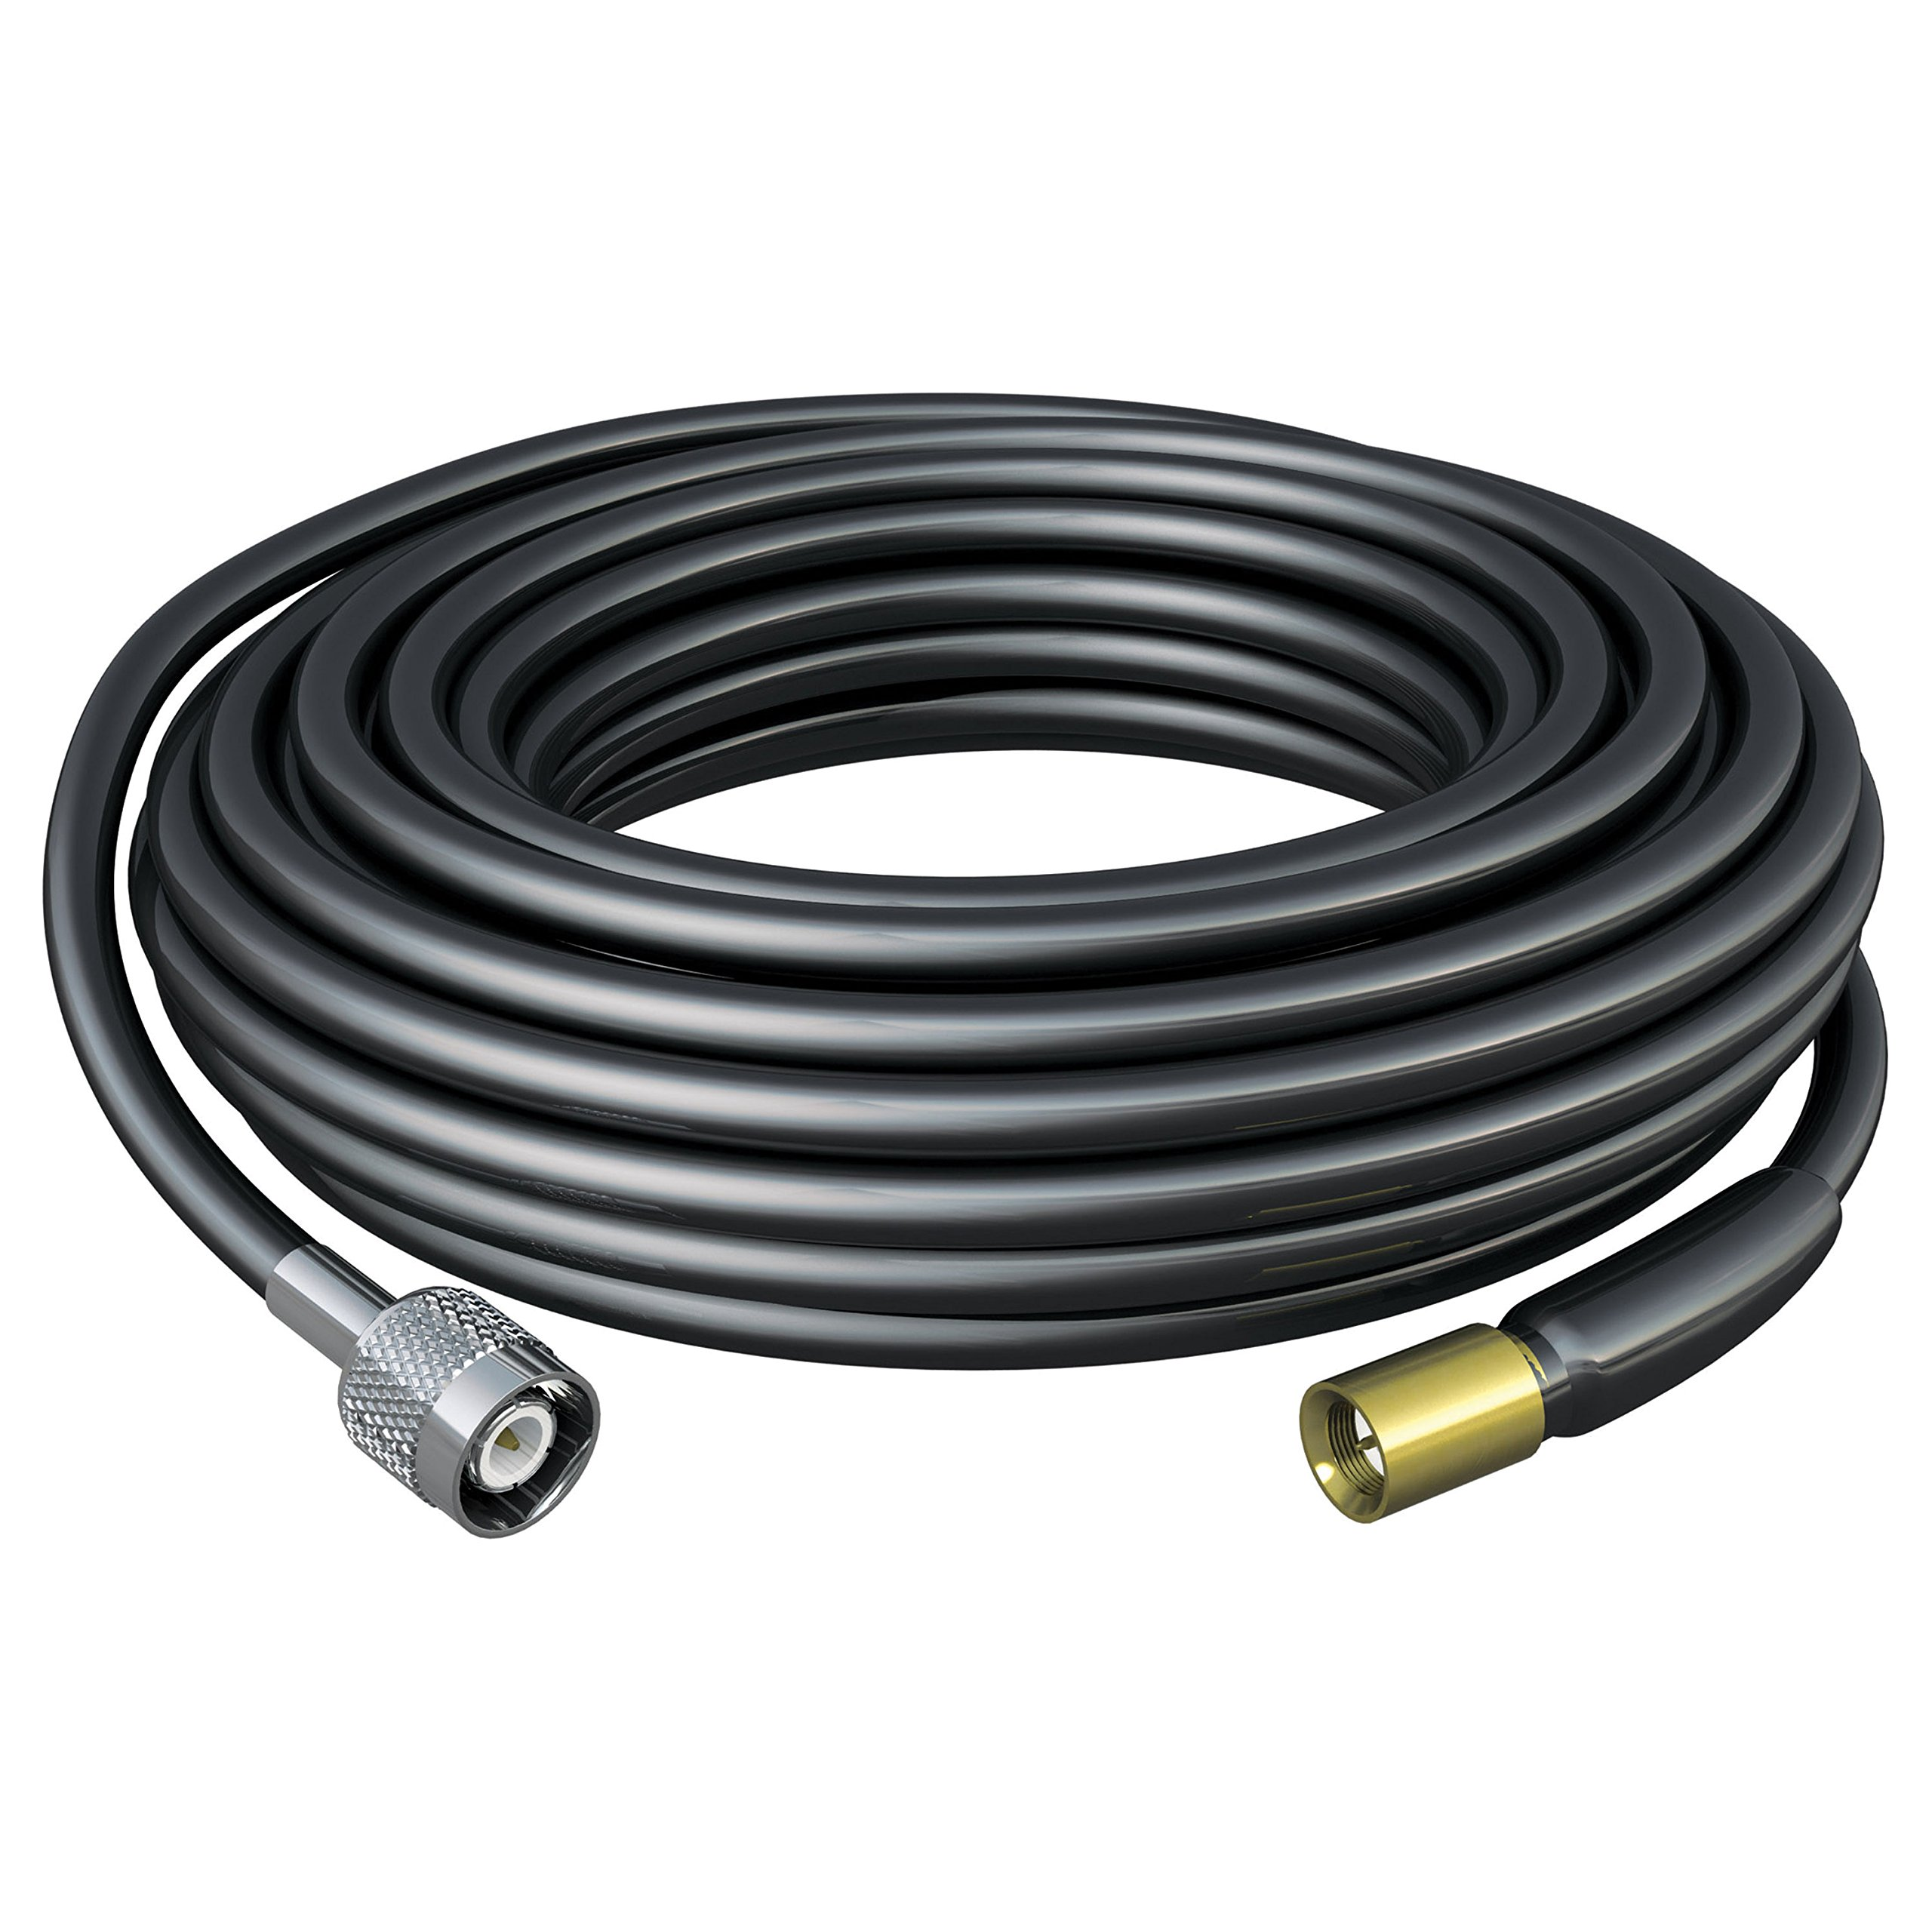 Shakespeare SRC-50 50' RG-58 SiriusXM Cable Kit